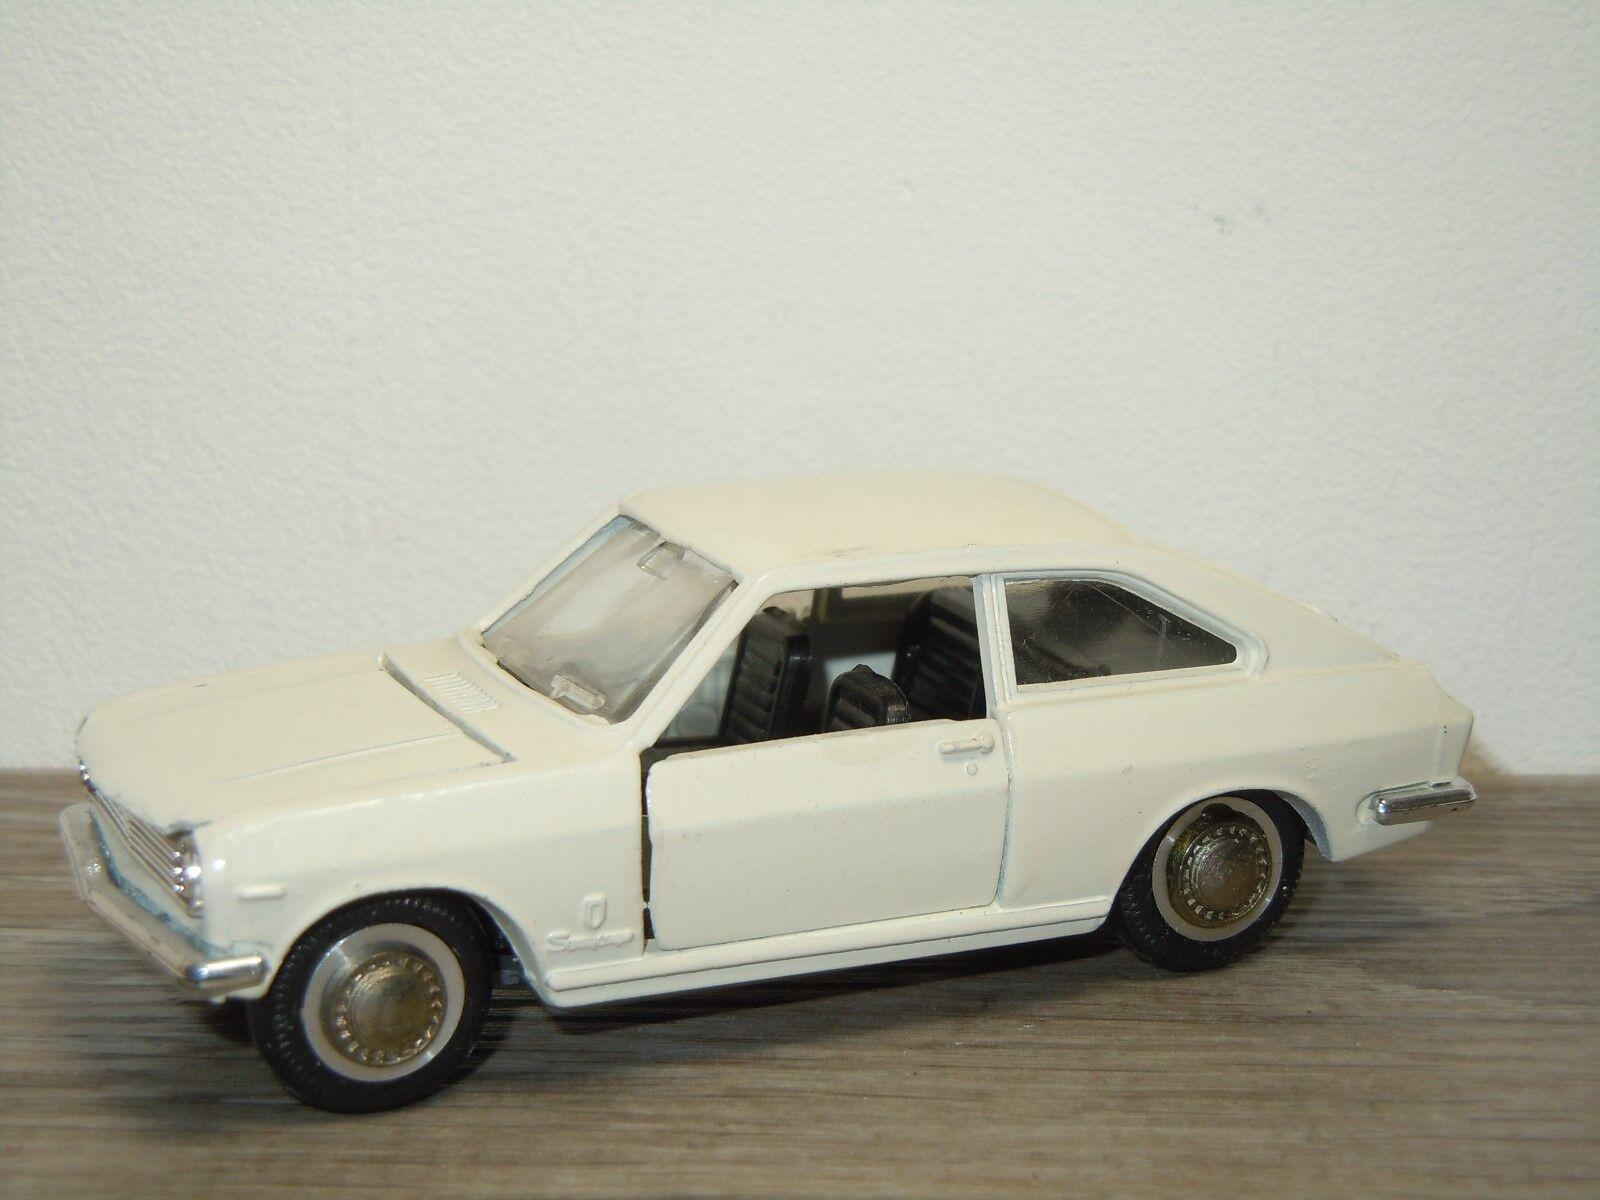 negozio d'offerta Nissan Sunny Coupe - Diapet Yoneazawa giocattoli D-223 Japan Japan Japan 1 40 33031  servizio di prima classe